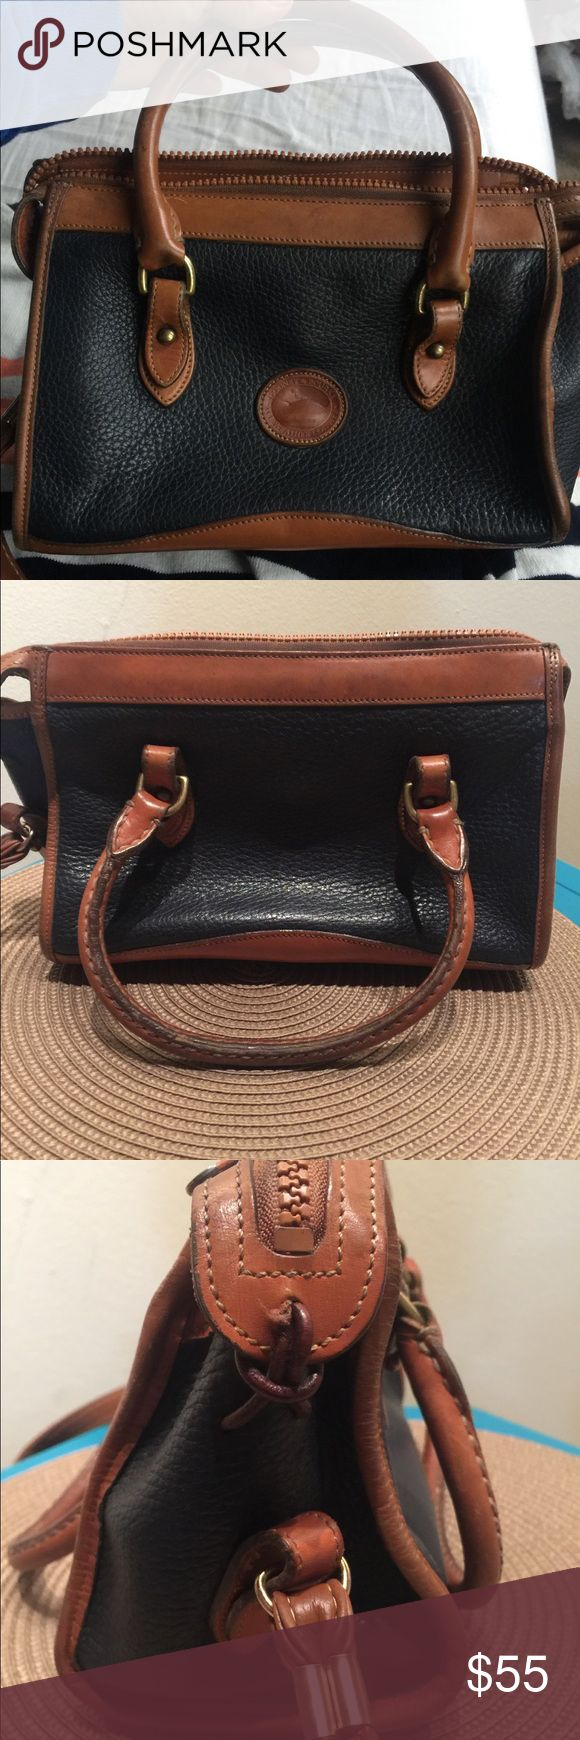 "Vintage Dooney & Bourke Navy Blue & Brown Satchel Navy blue with Dark Brown leather trim Bag depth 4"" Bag length 11.5"" Bag height 8"" Medium sized Bag Satchel  Lots of storage space Dooney & Bourke Bags Satchels"